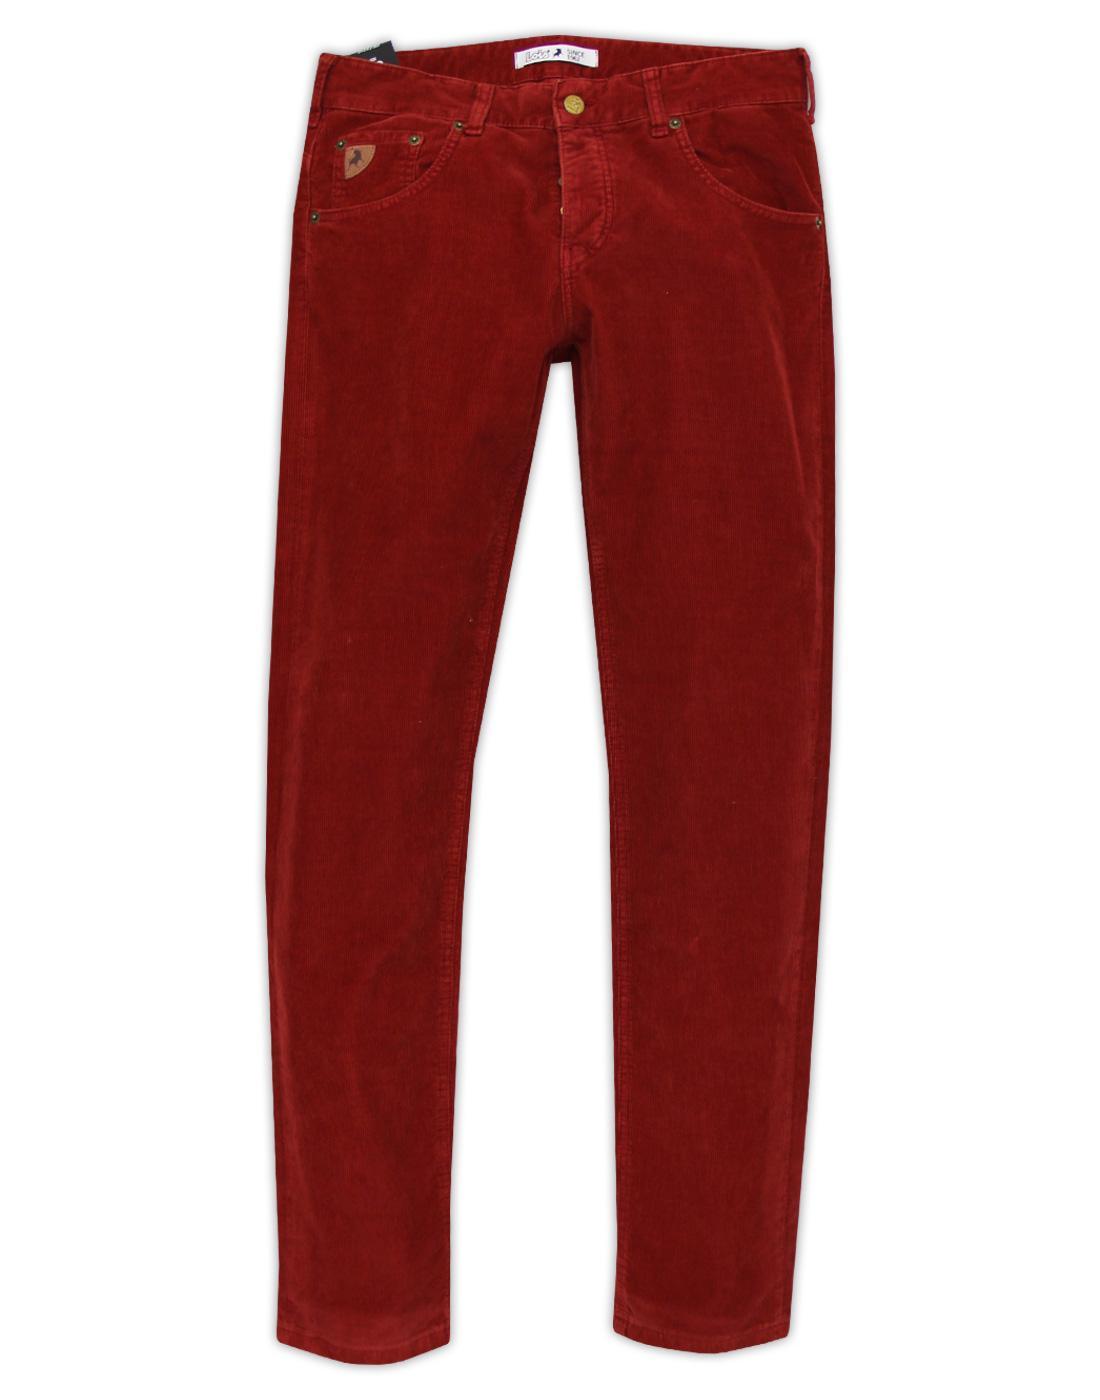 Sierra LOIS Mod Casuals Needle Cord Trousers (Bu)